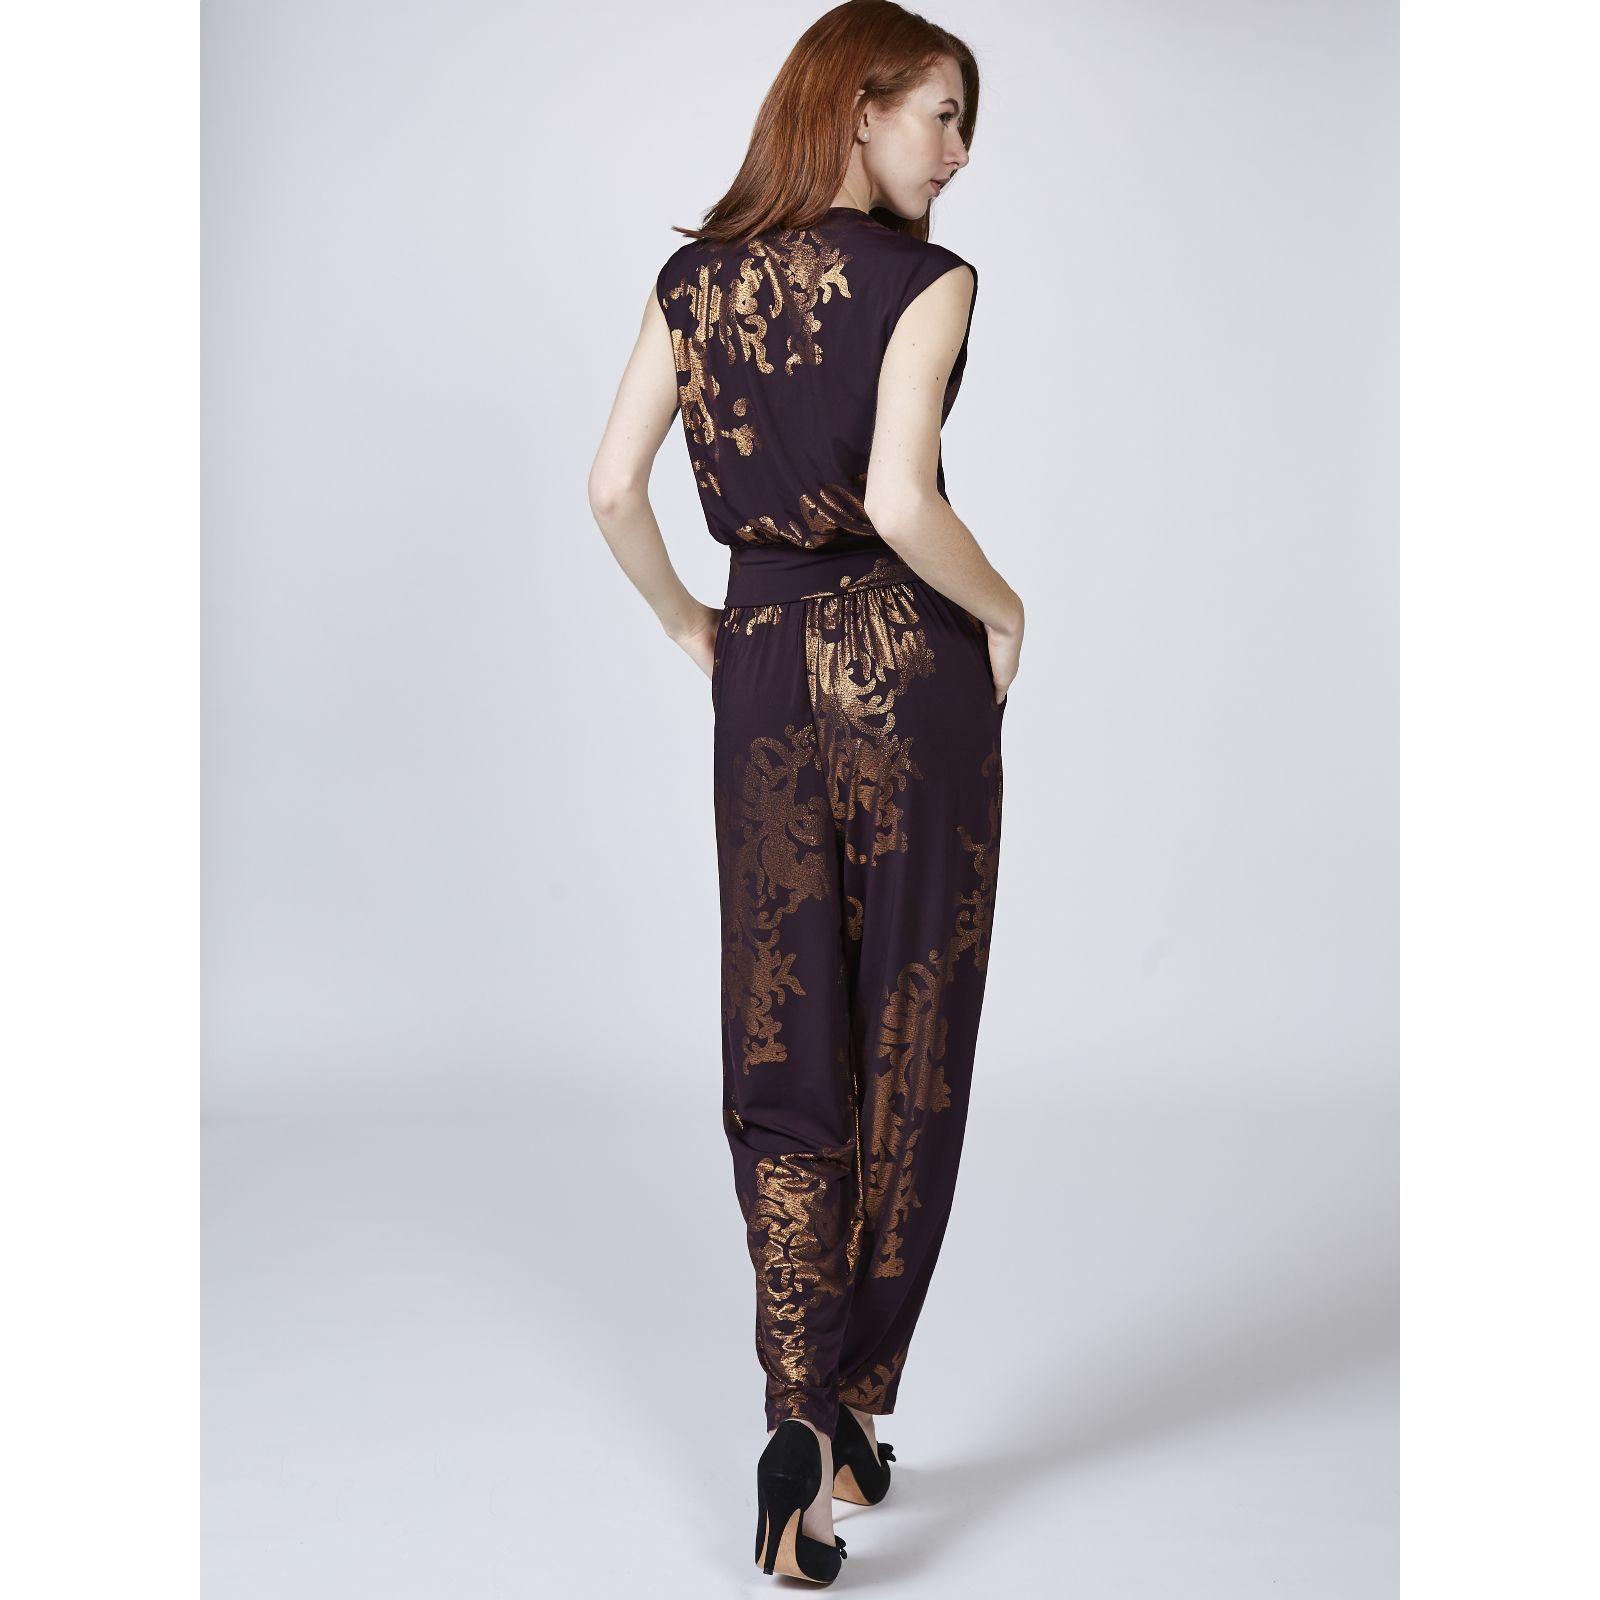 0262af6a08 Kim & Co Oriental Foil Brazil Jersey Cross Over Pocket Jumpsuit - Page 1 -  QVC UK